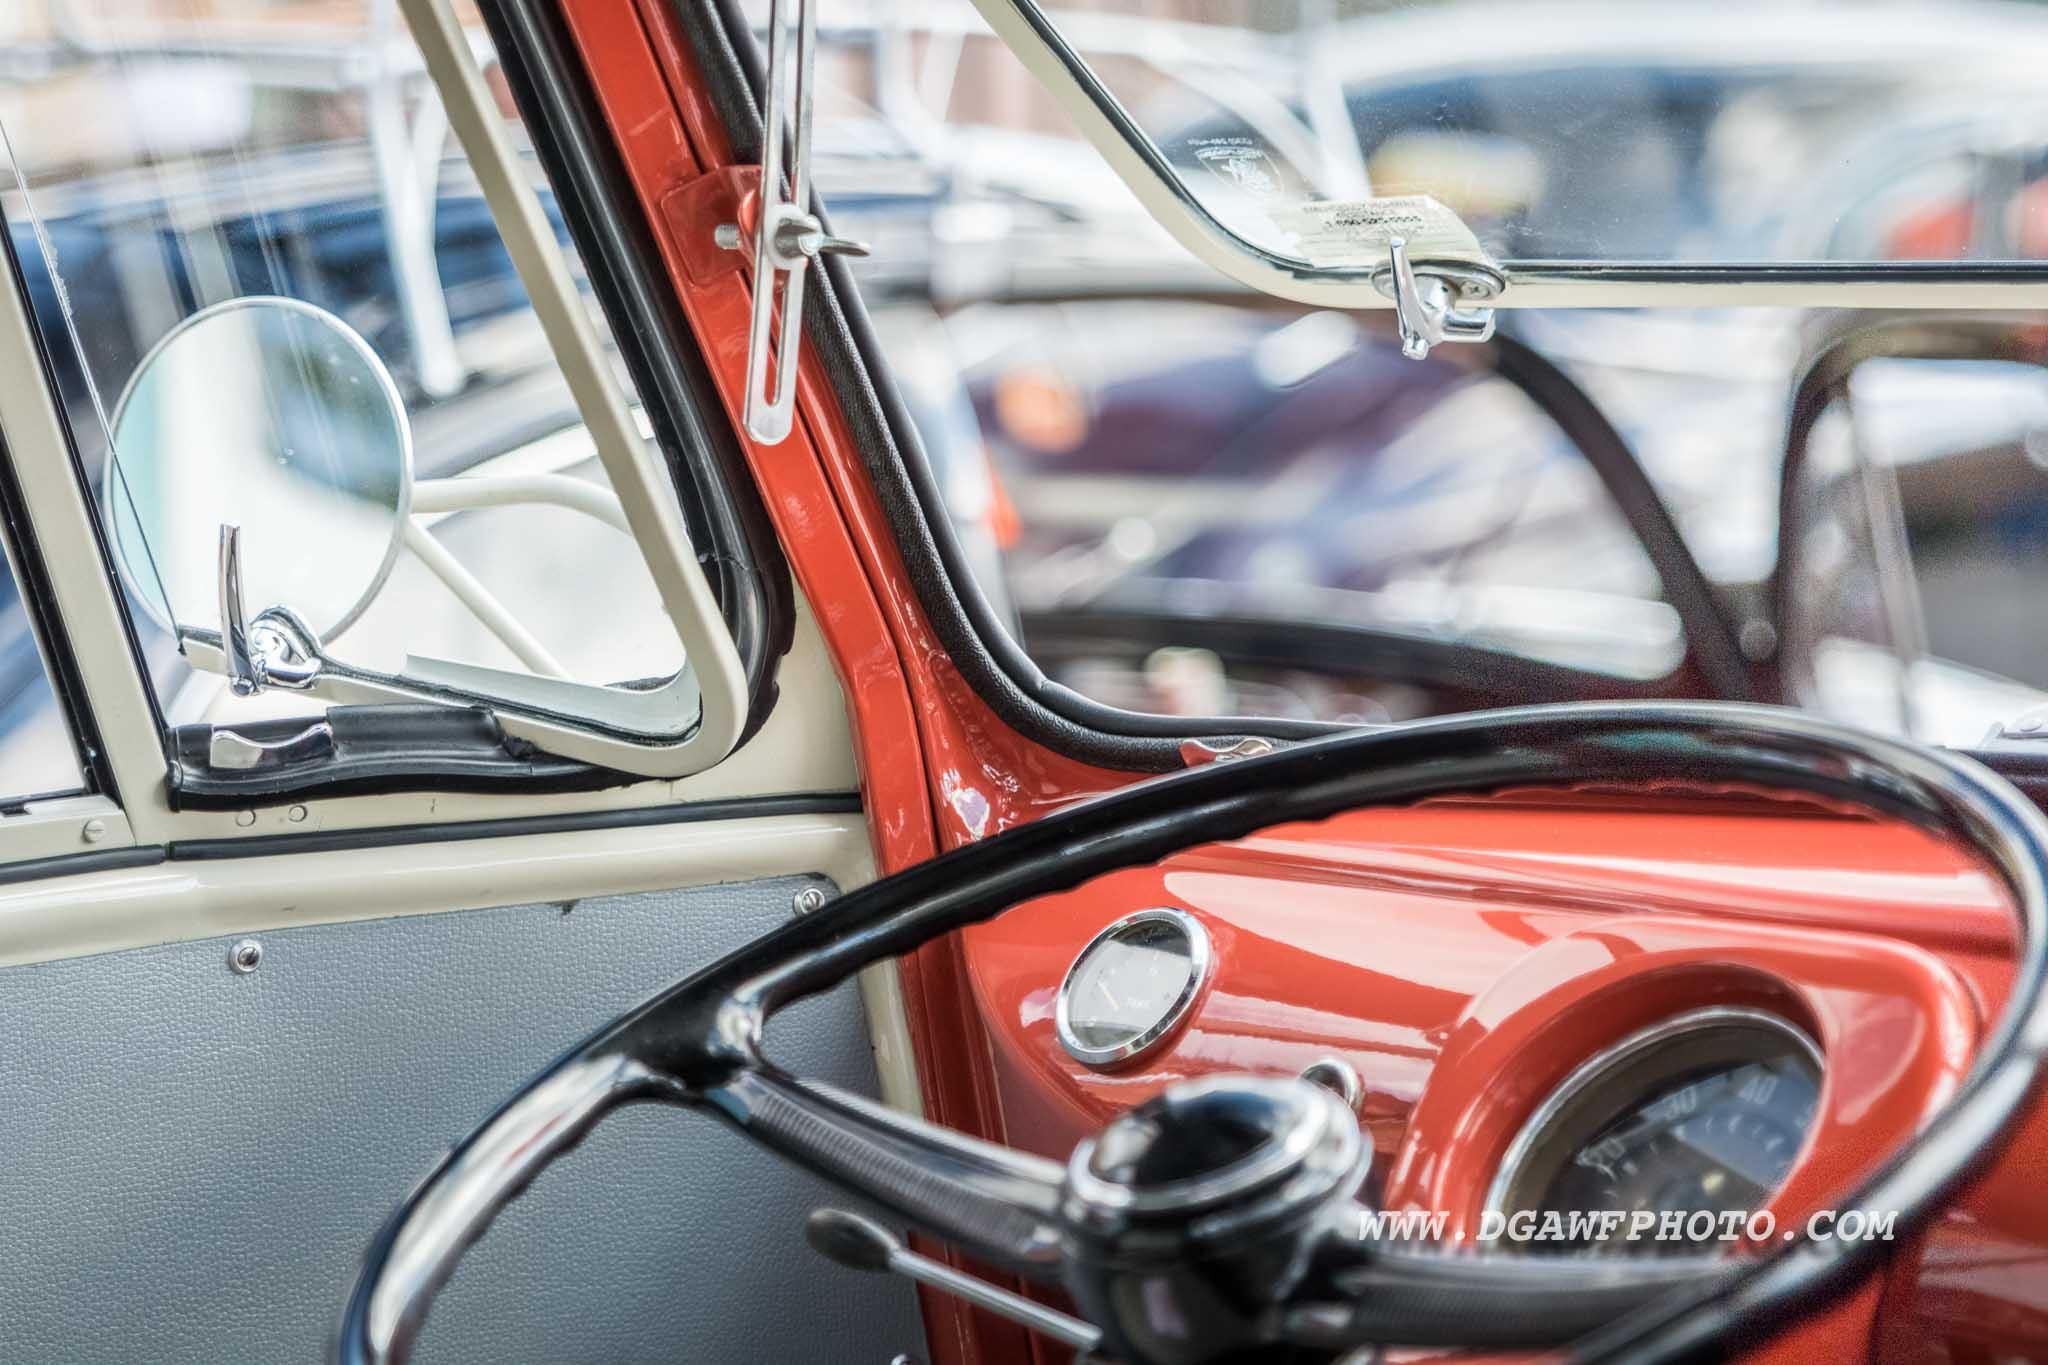 DGawfPhoto-115.jpg